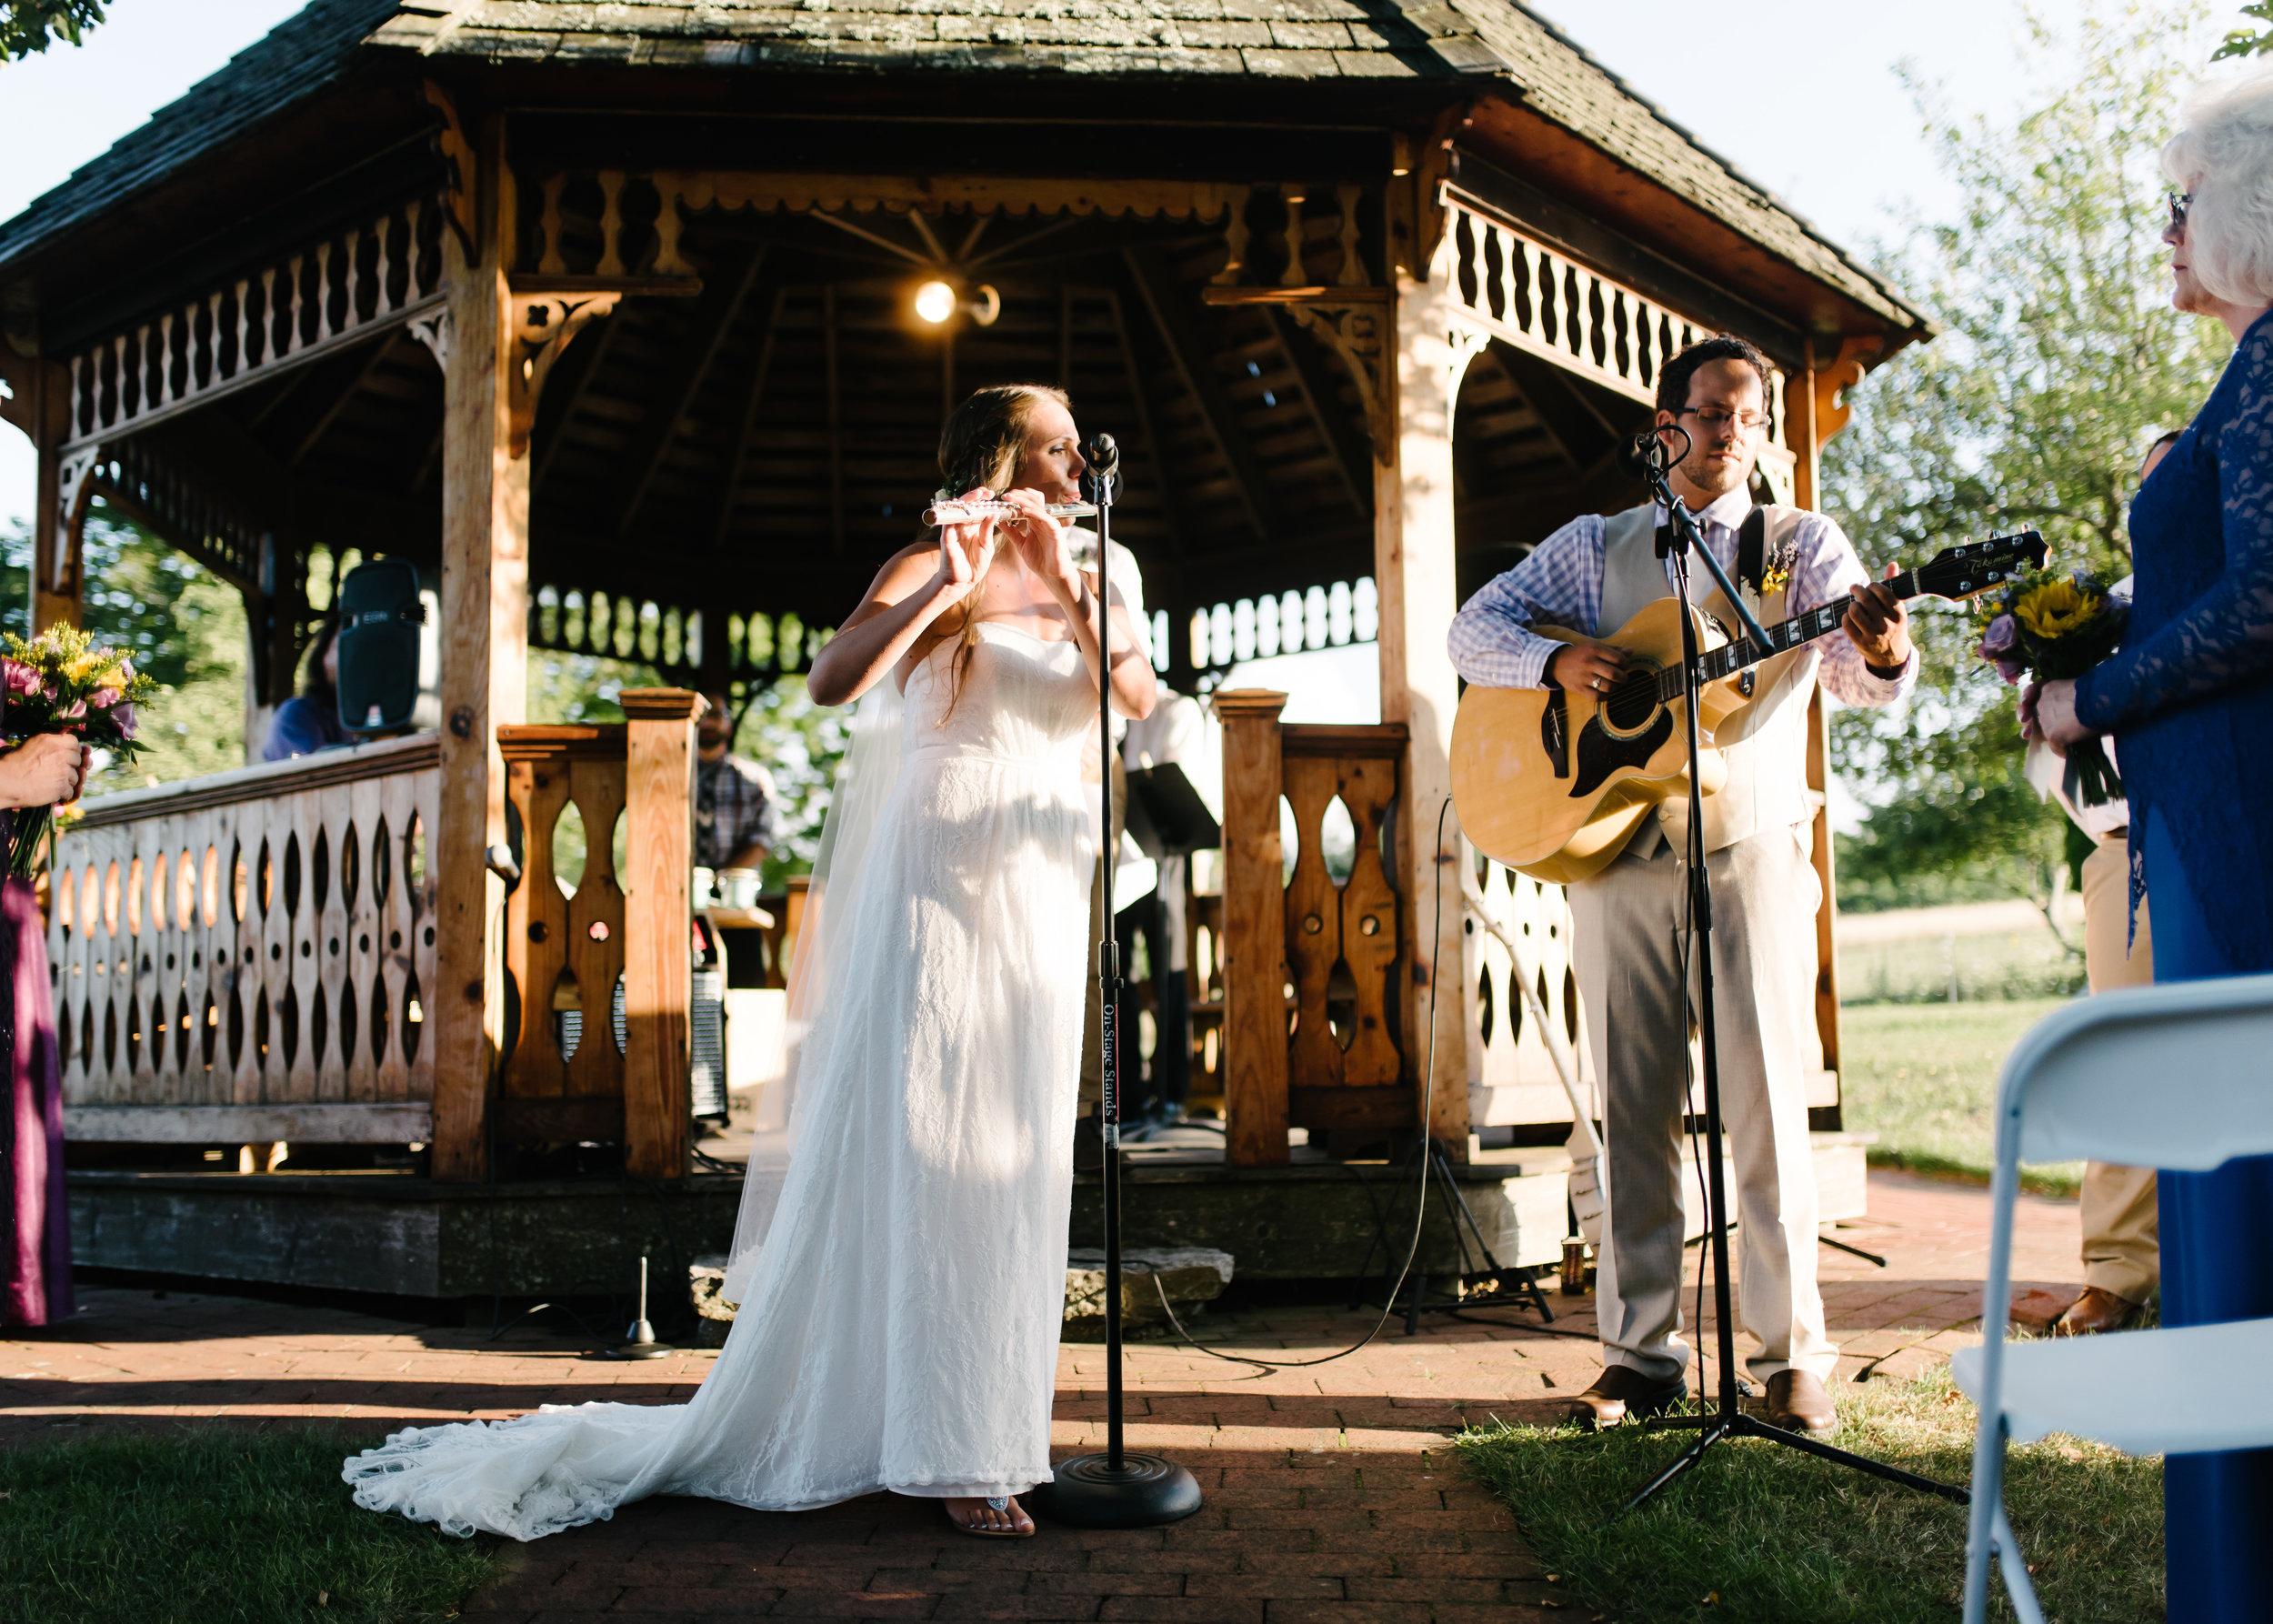 worcester-ma-wedding-photographer-4240.jpg